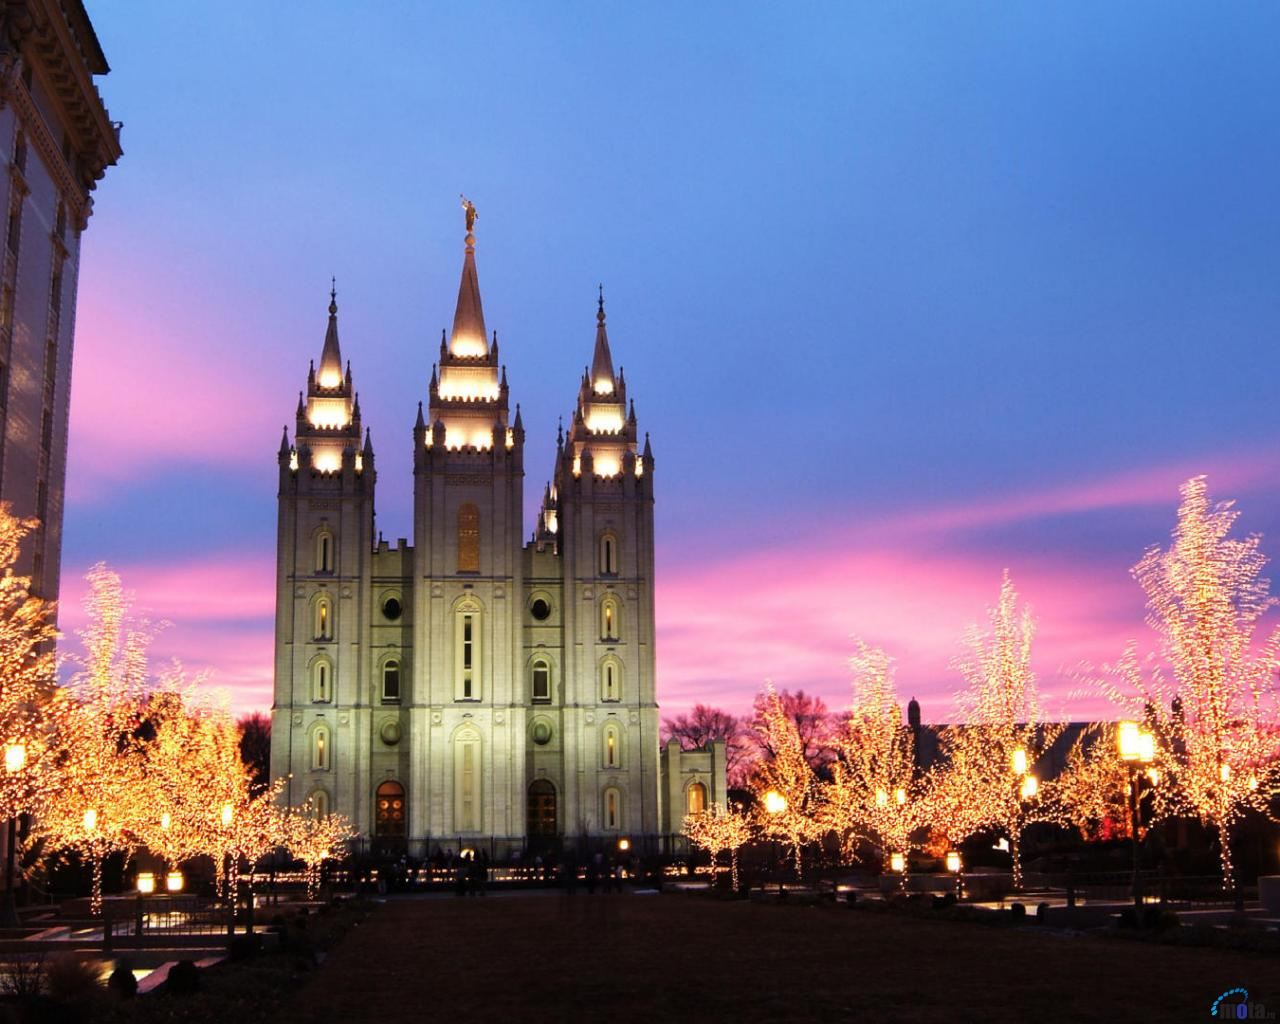 download Download Wallpaper Mormon Temple at Christmas Salt 1280x1024